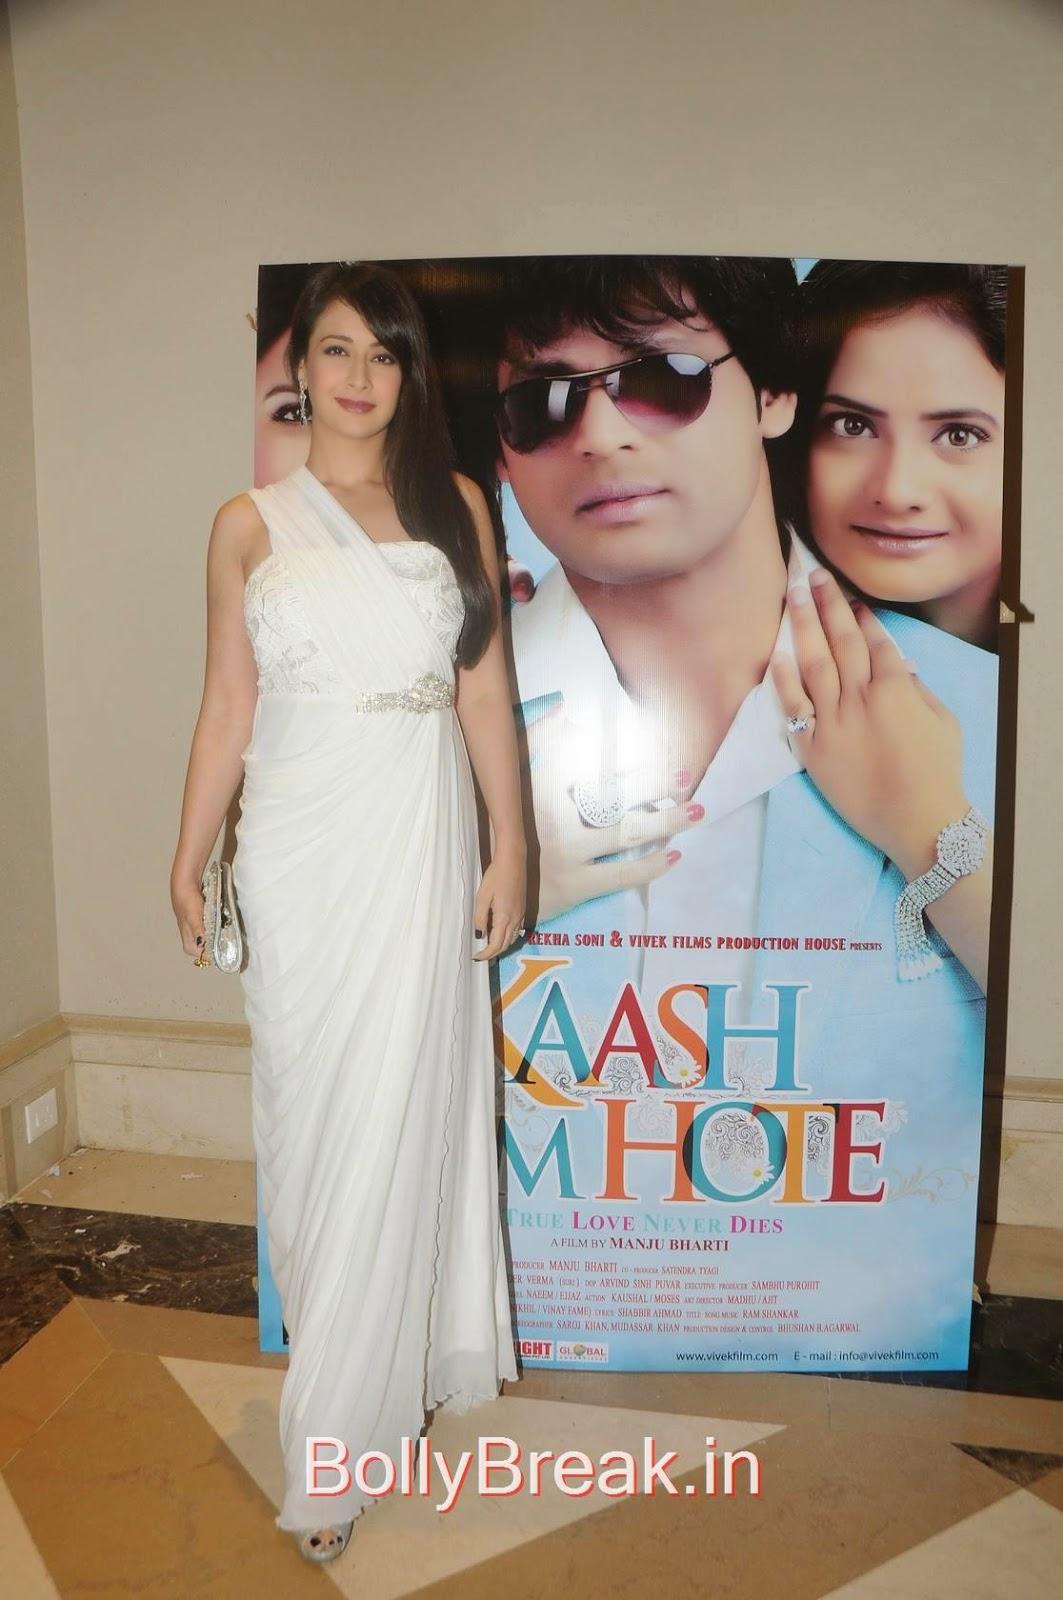 Preeti Jhangiani Unseen Stills, Preeti Jhangiani Hot Pics in white dress from Kaash Tum Hote Trailer Launch